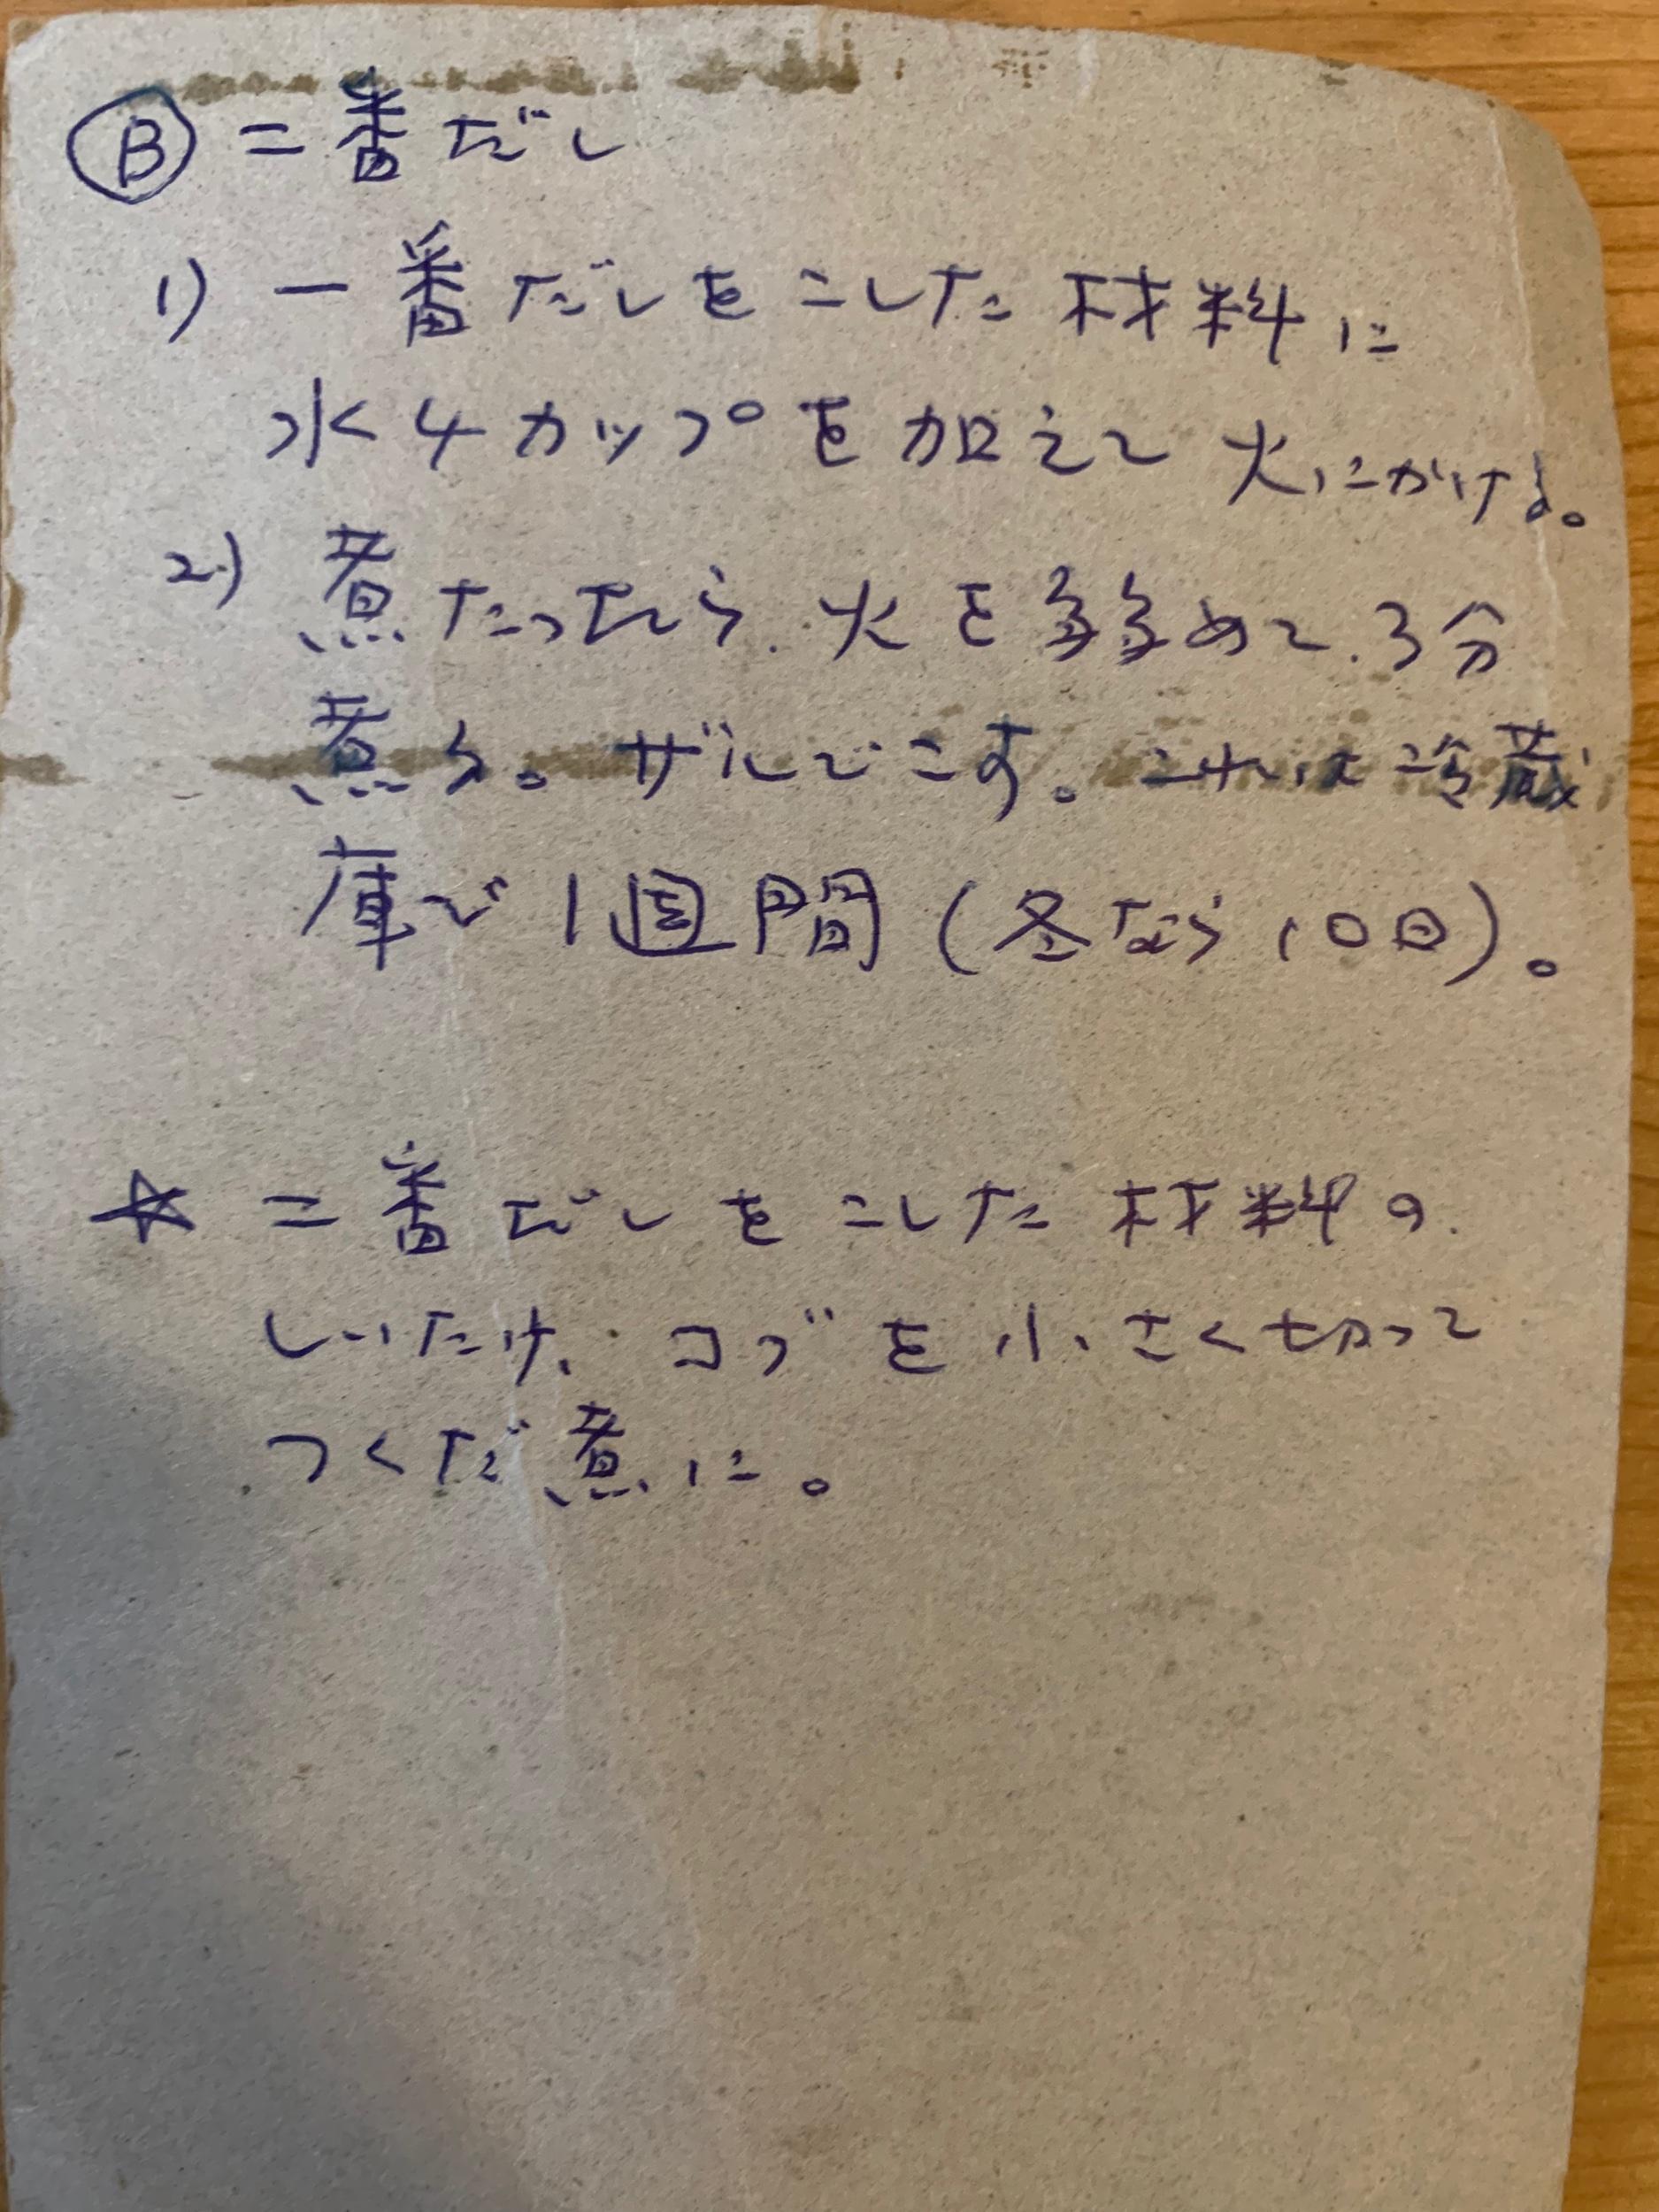 Keiko recipe, 2bandashi. Will be used tonight's buckwheats noodle dinner.